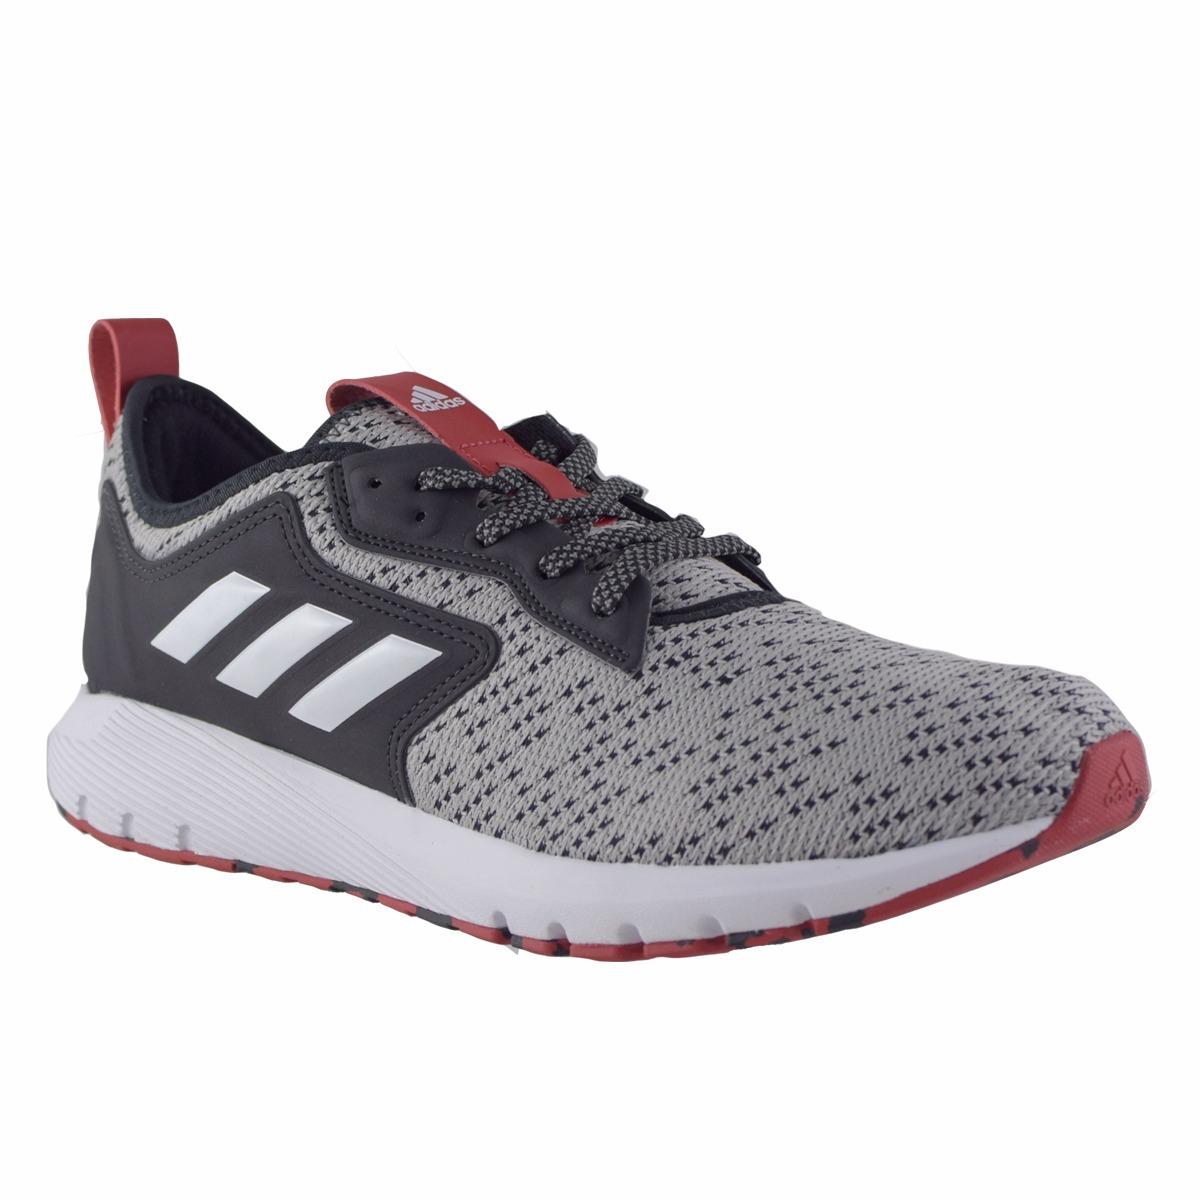 new products 6bc4f f20d2 zapatillas adidas skyfreeze 2 hombre. Cargando zoom.